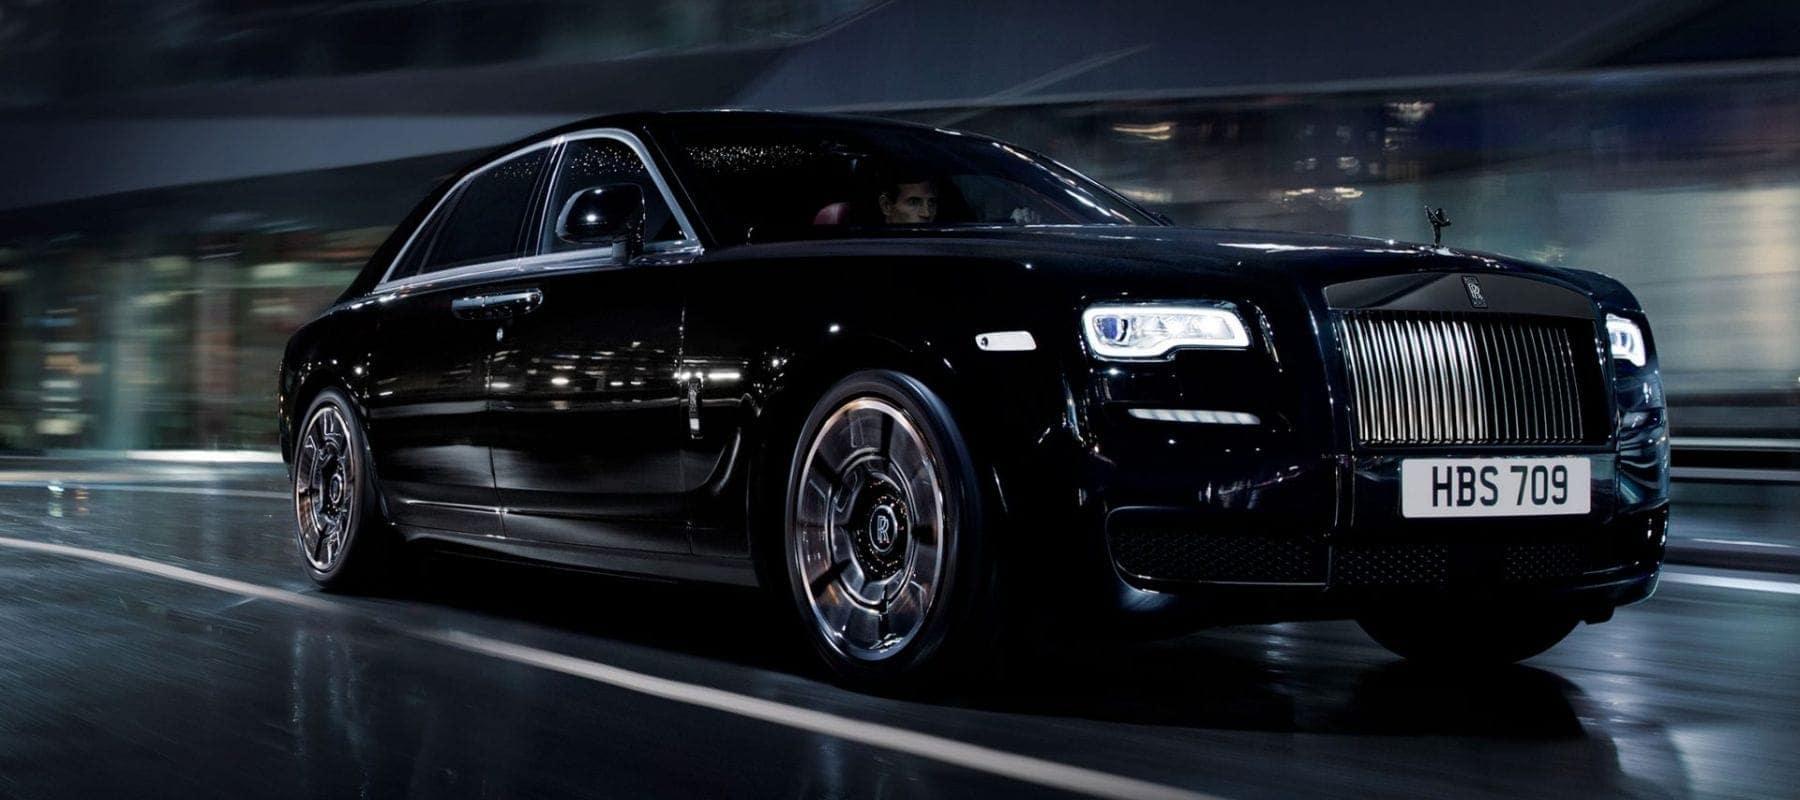 Rolls-Royce Motor Cars Austin